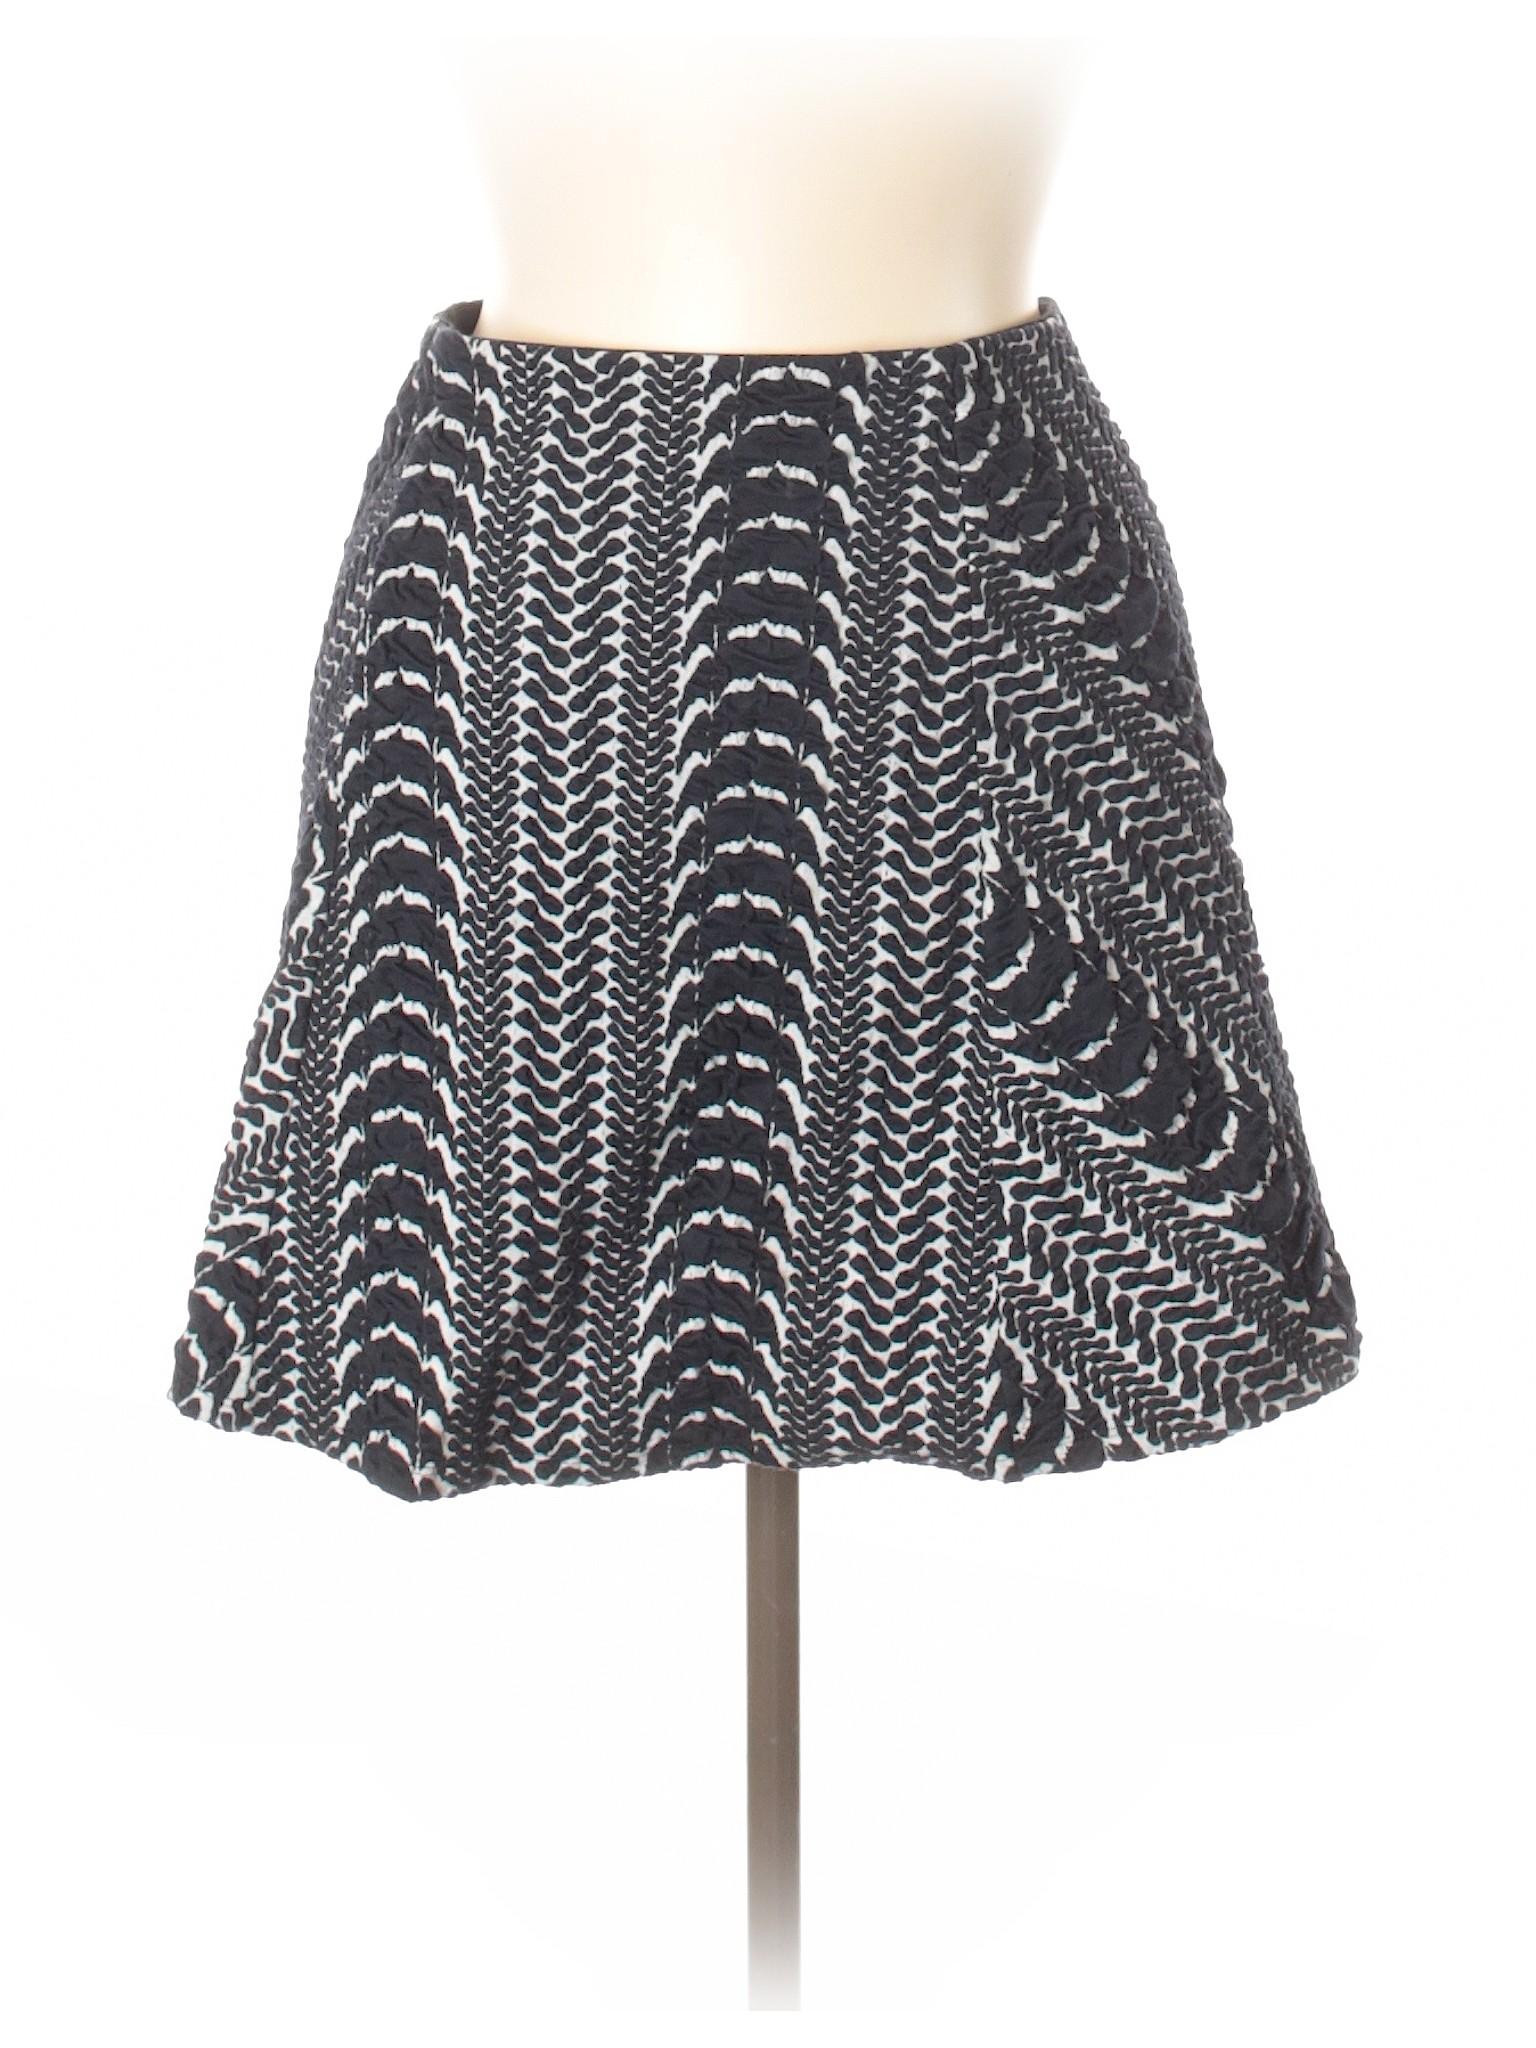 Boutique Casual Skirt Casual Skirt Casual Boutique Boutique Casual Skirt Skirt Boutique rExqZrwO0C